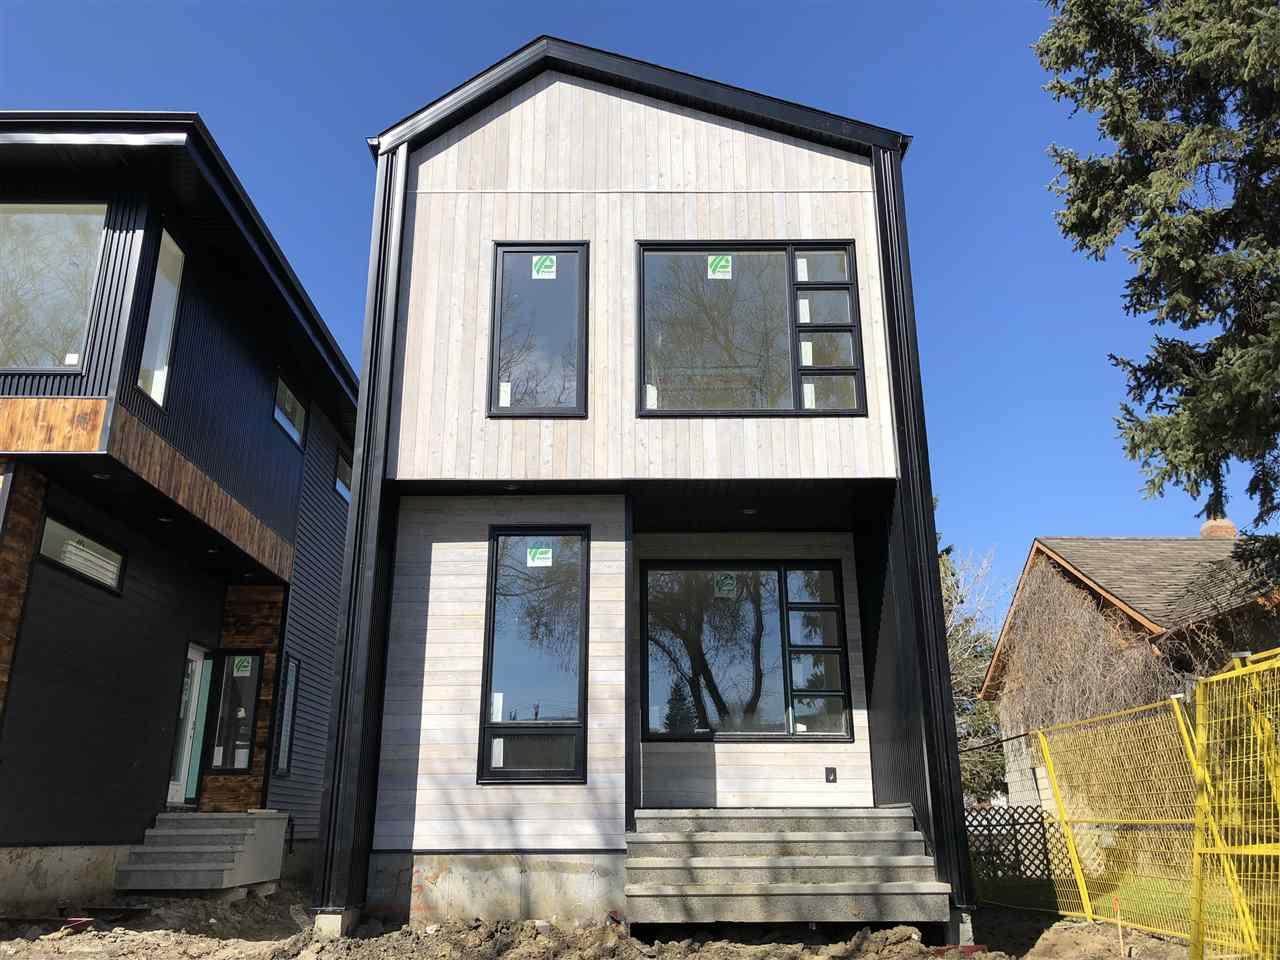 Main Photo: 10468 143 Street in Edmonton: Zone 21 House for sale : MLS®# E4156309